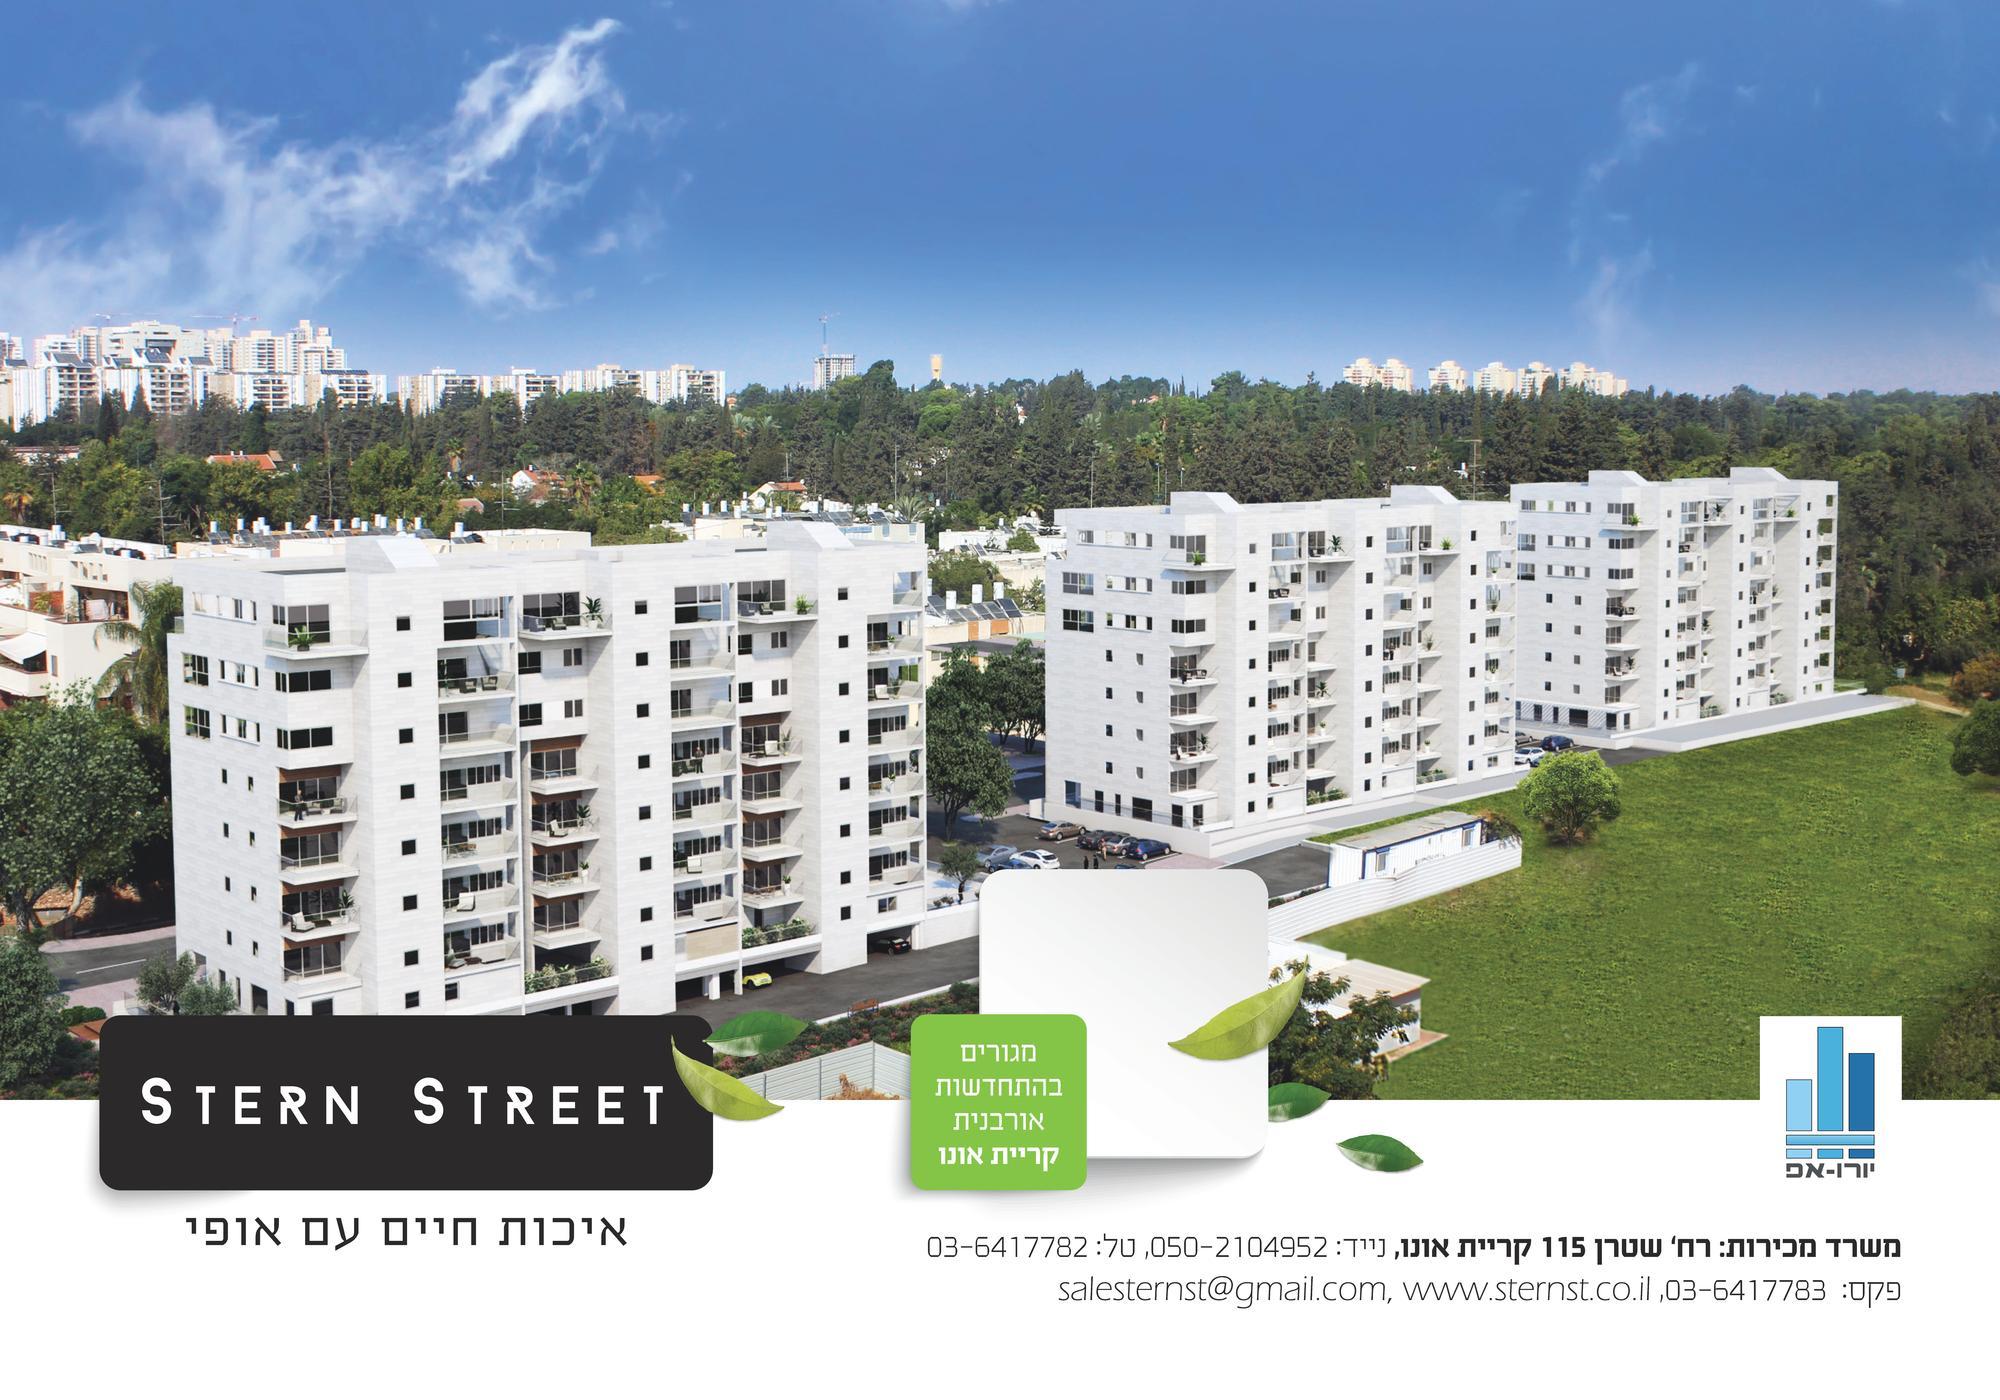 Stern Street